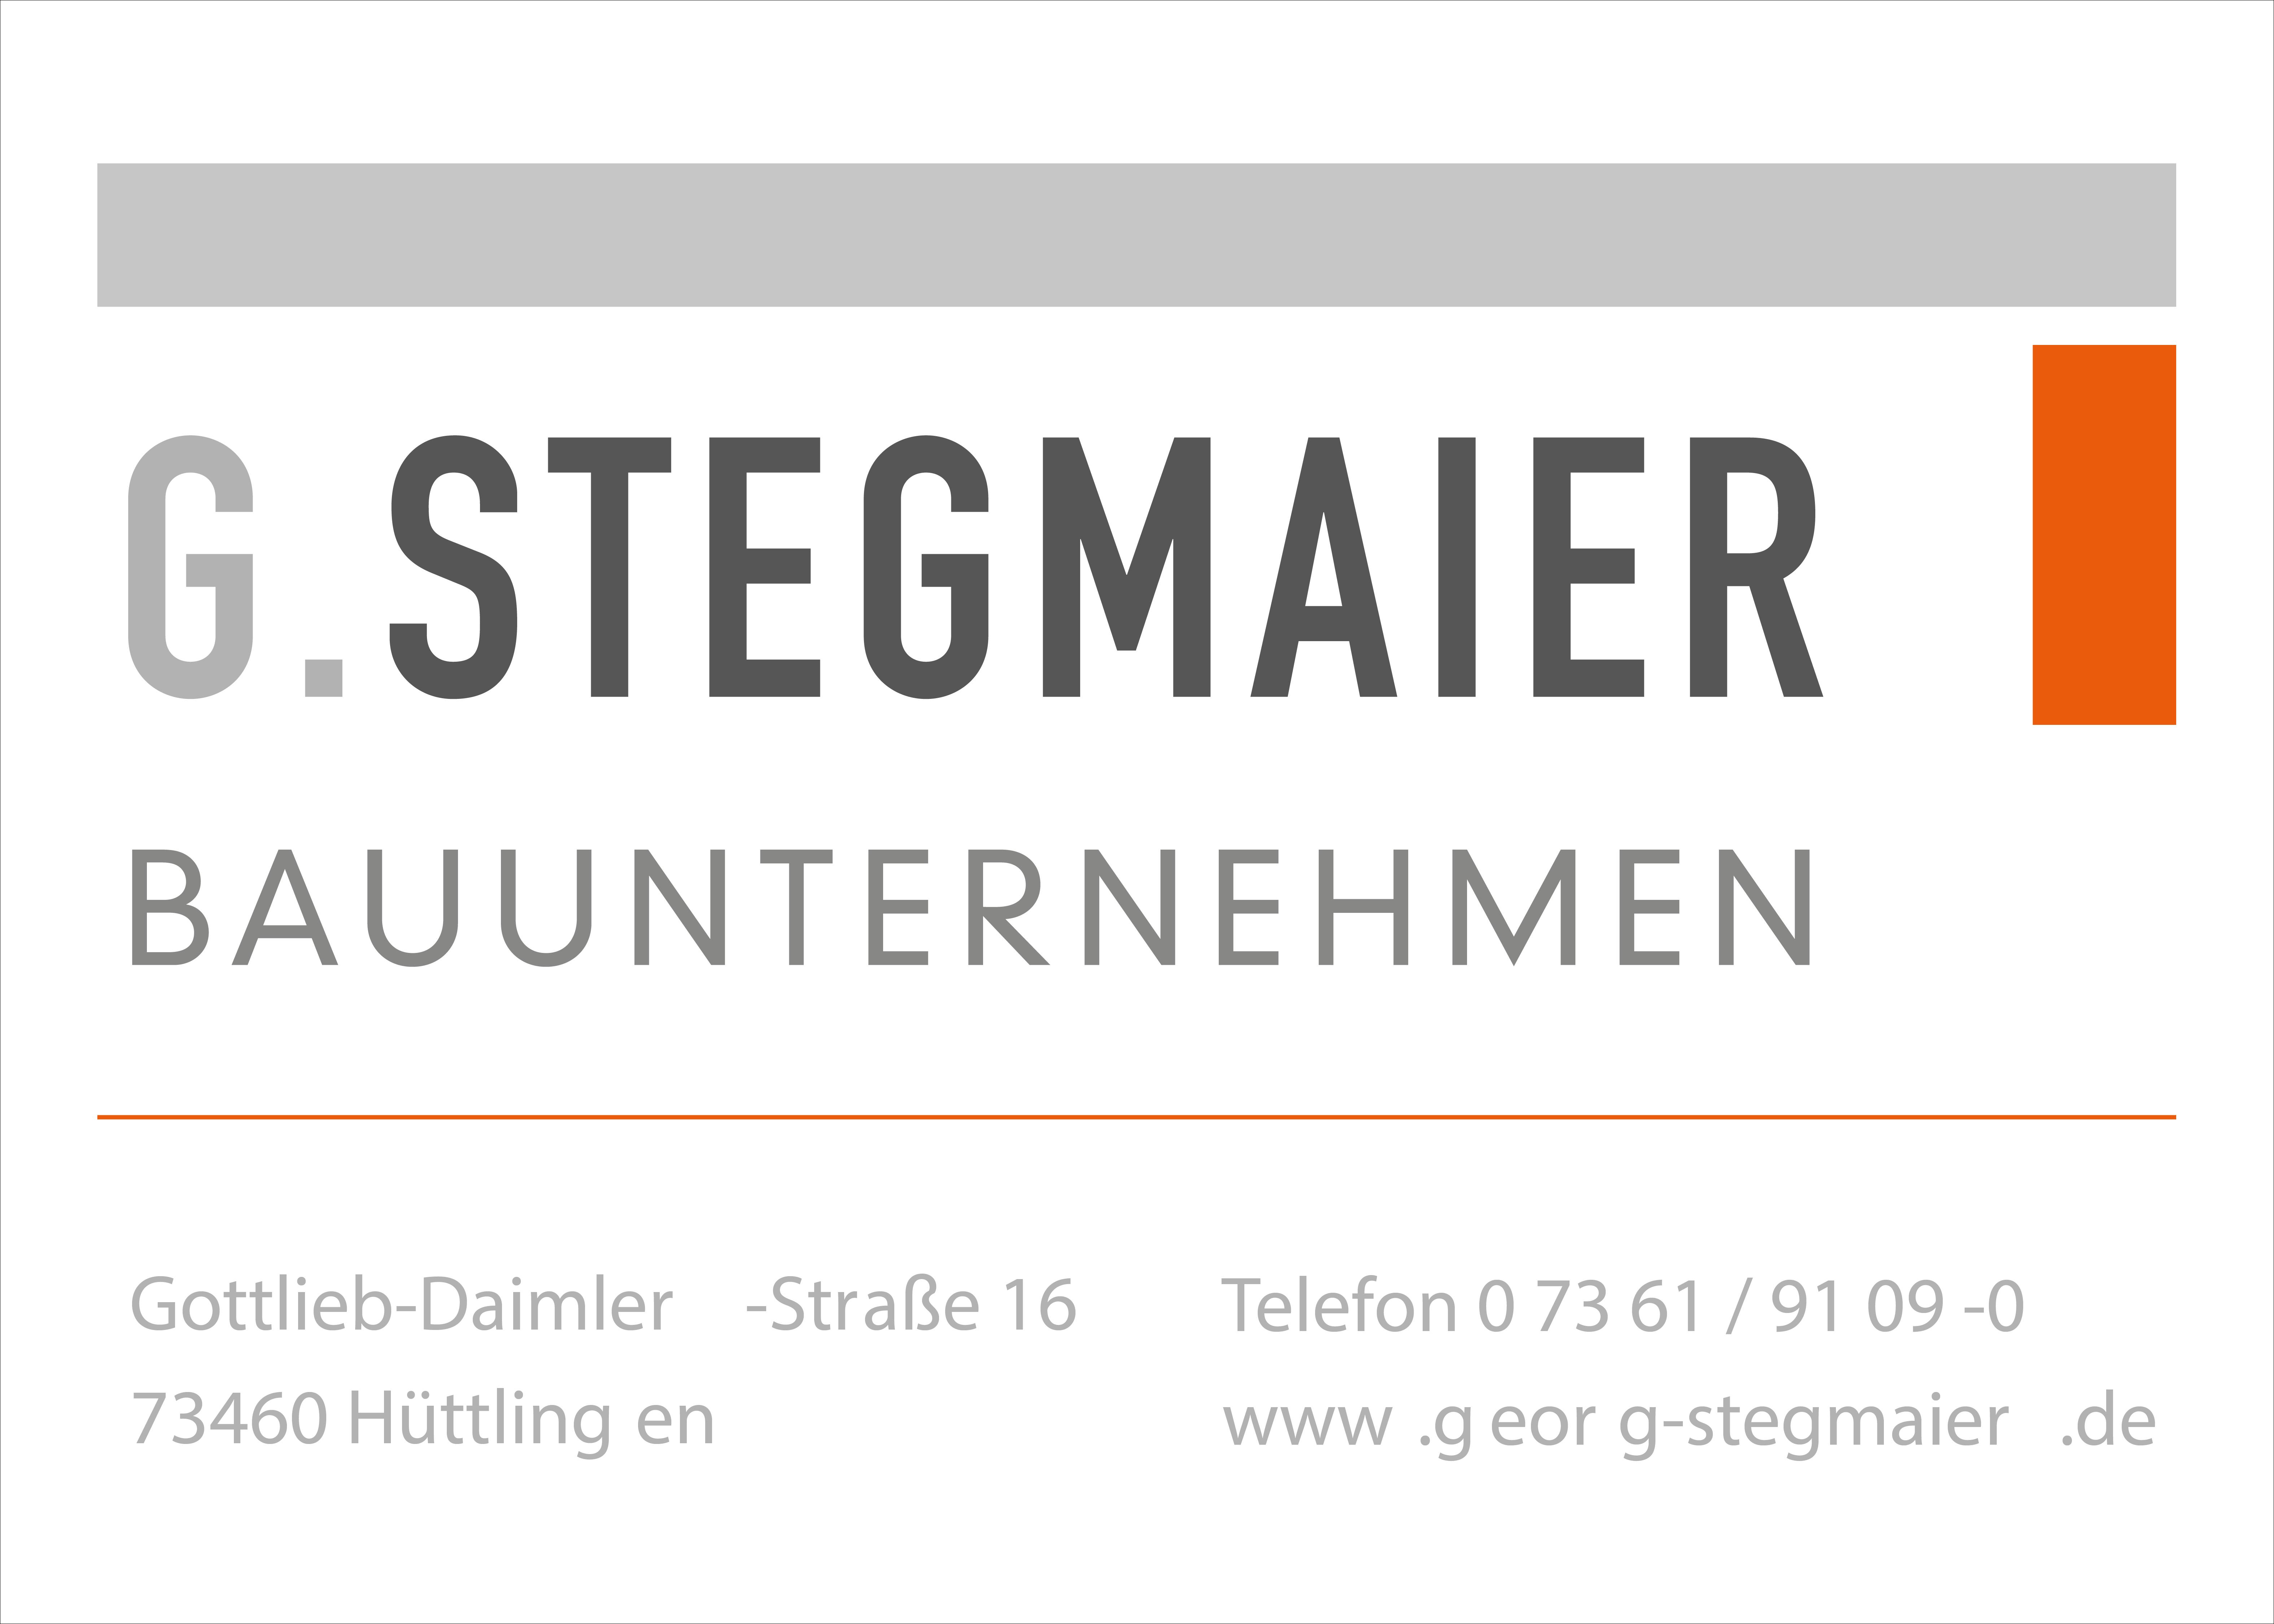 Stegmaier 1920